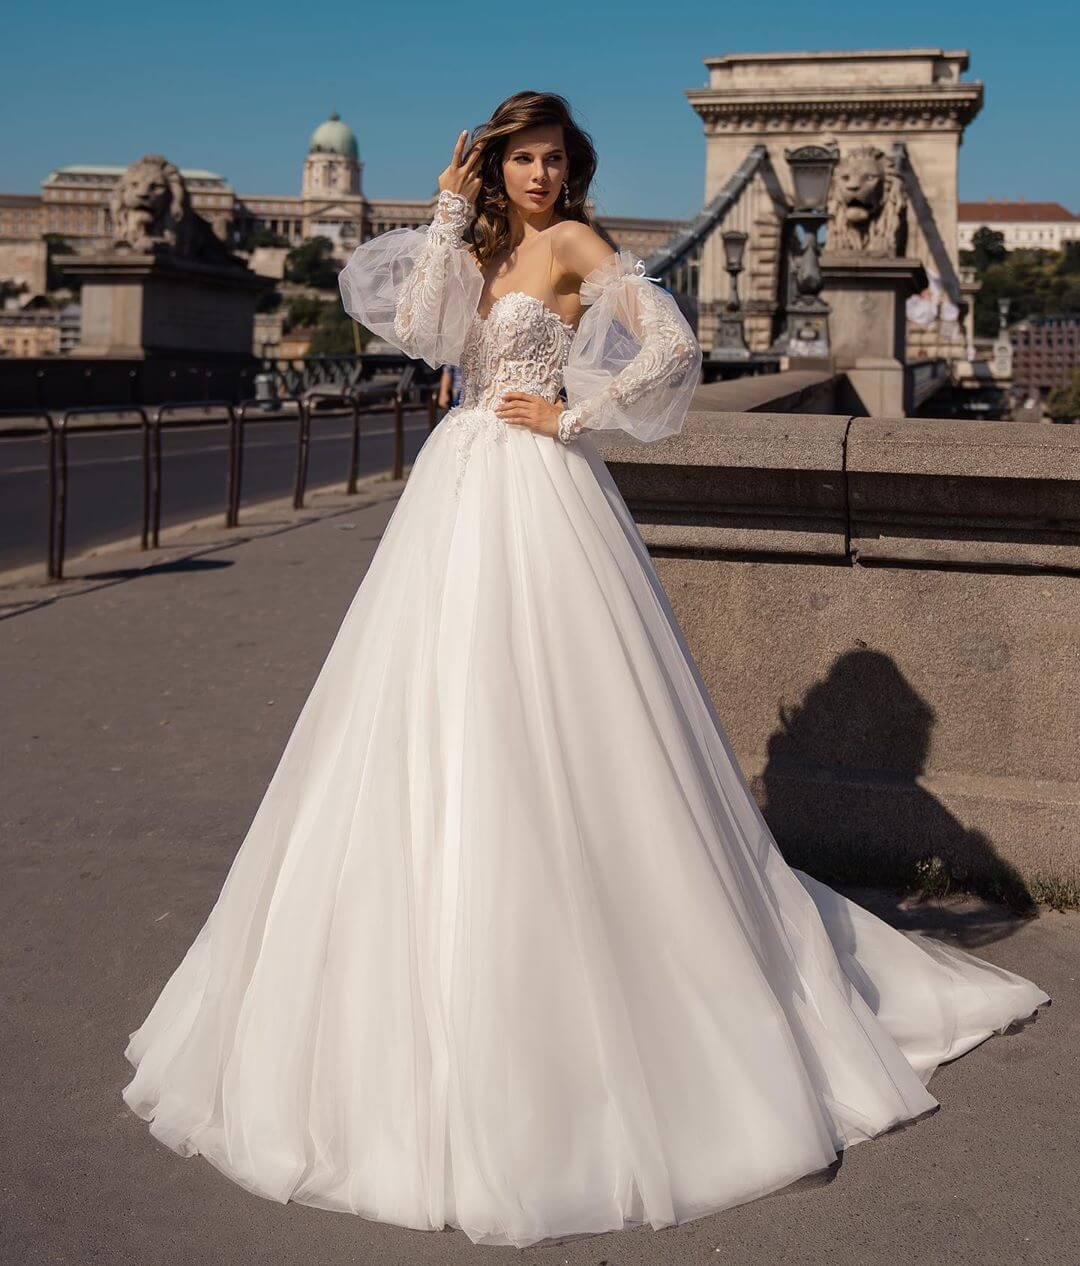 Christian wedding gowns